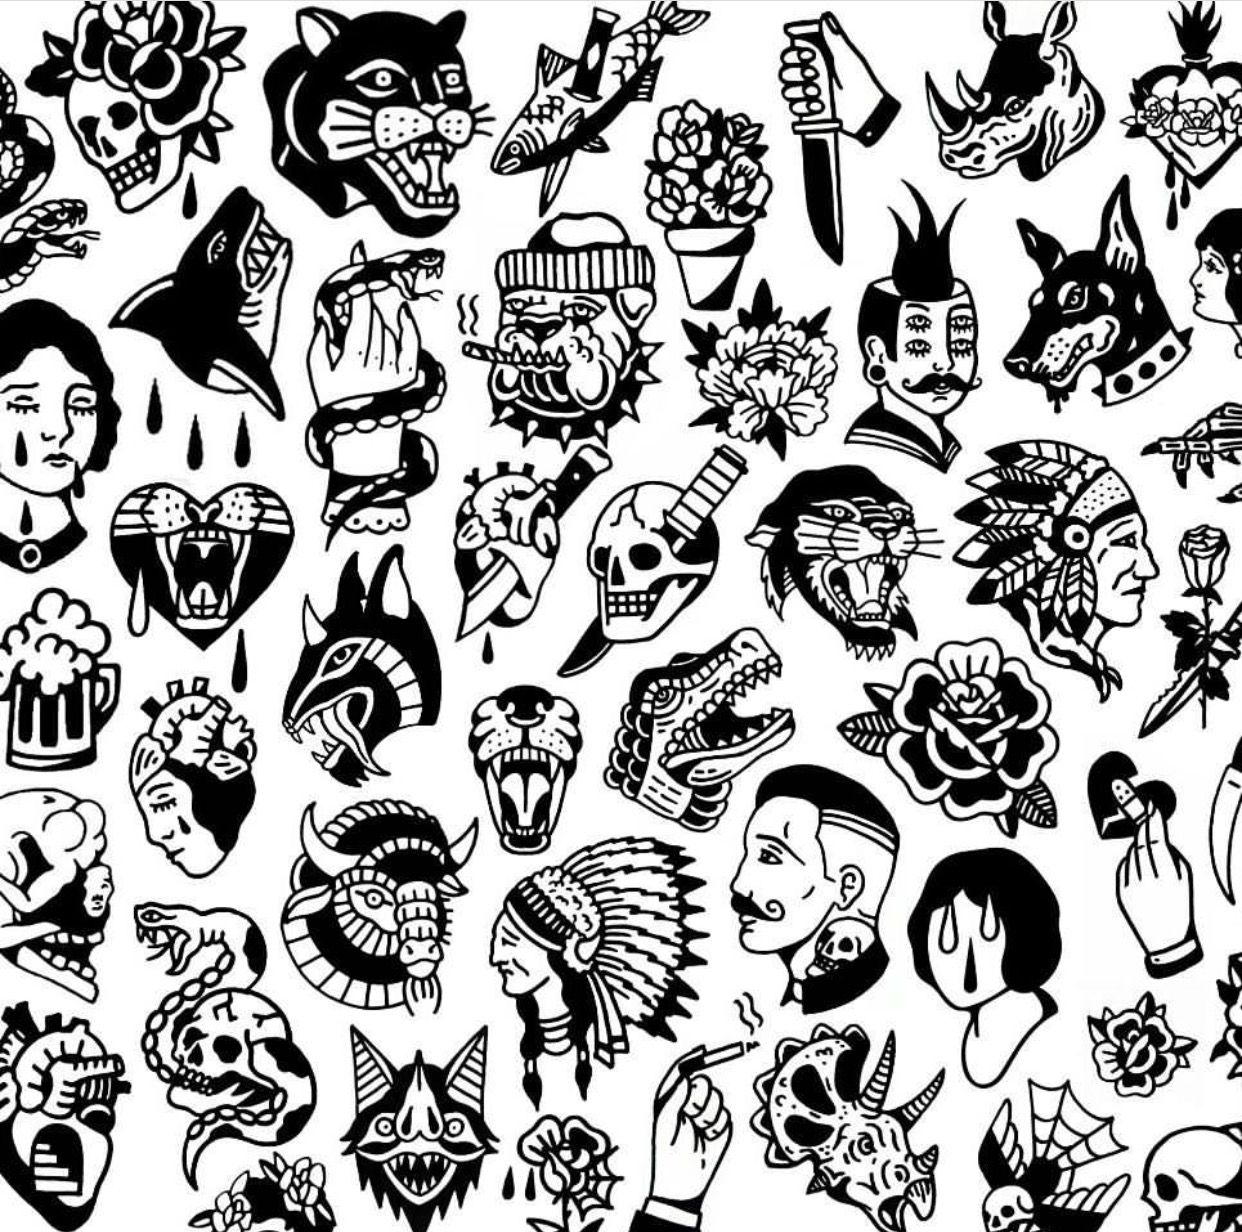 Pin By Mark Jarmie On Tattoos Traditional Tattoo Illustration Old School Tattoo Designs Traditional Tattoo Sleeve